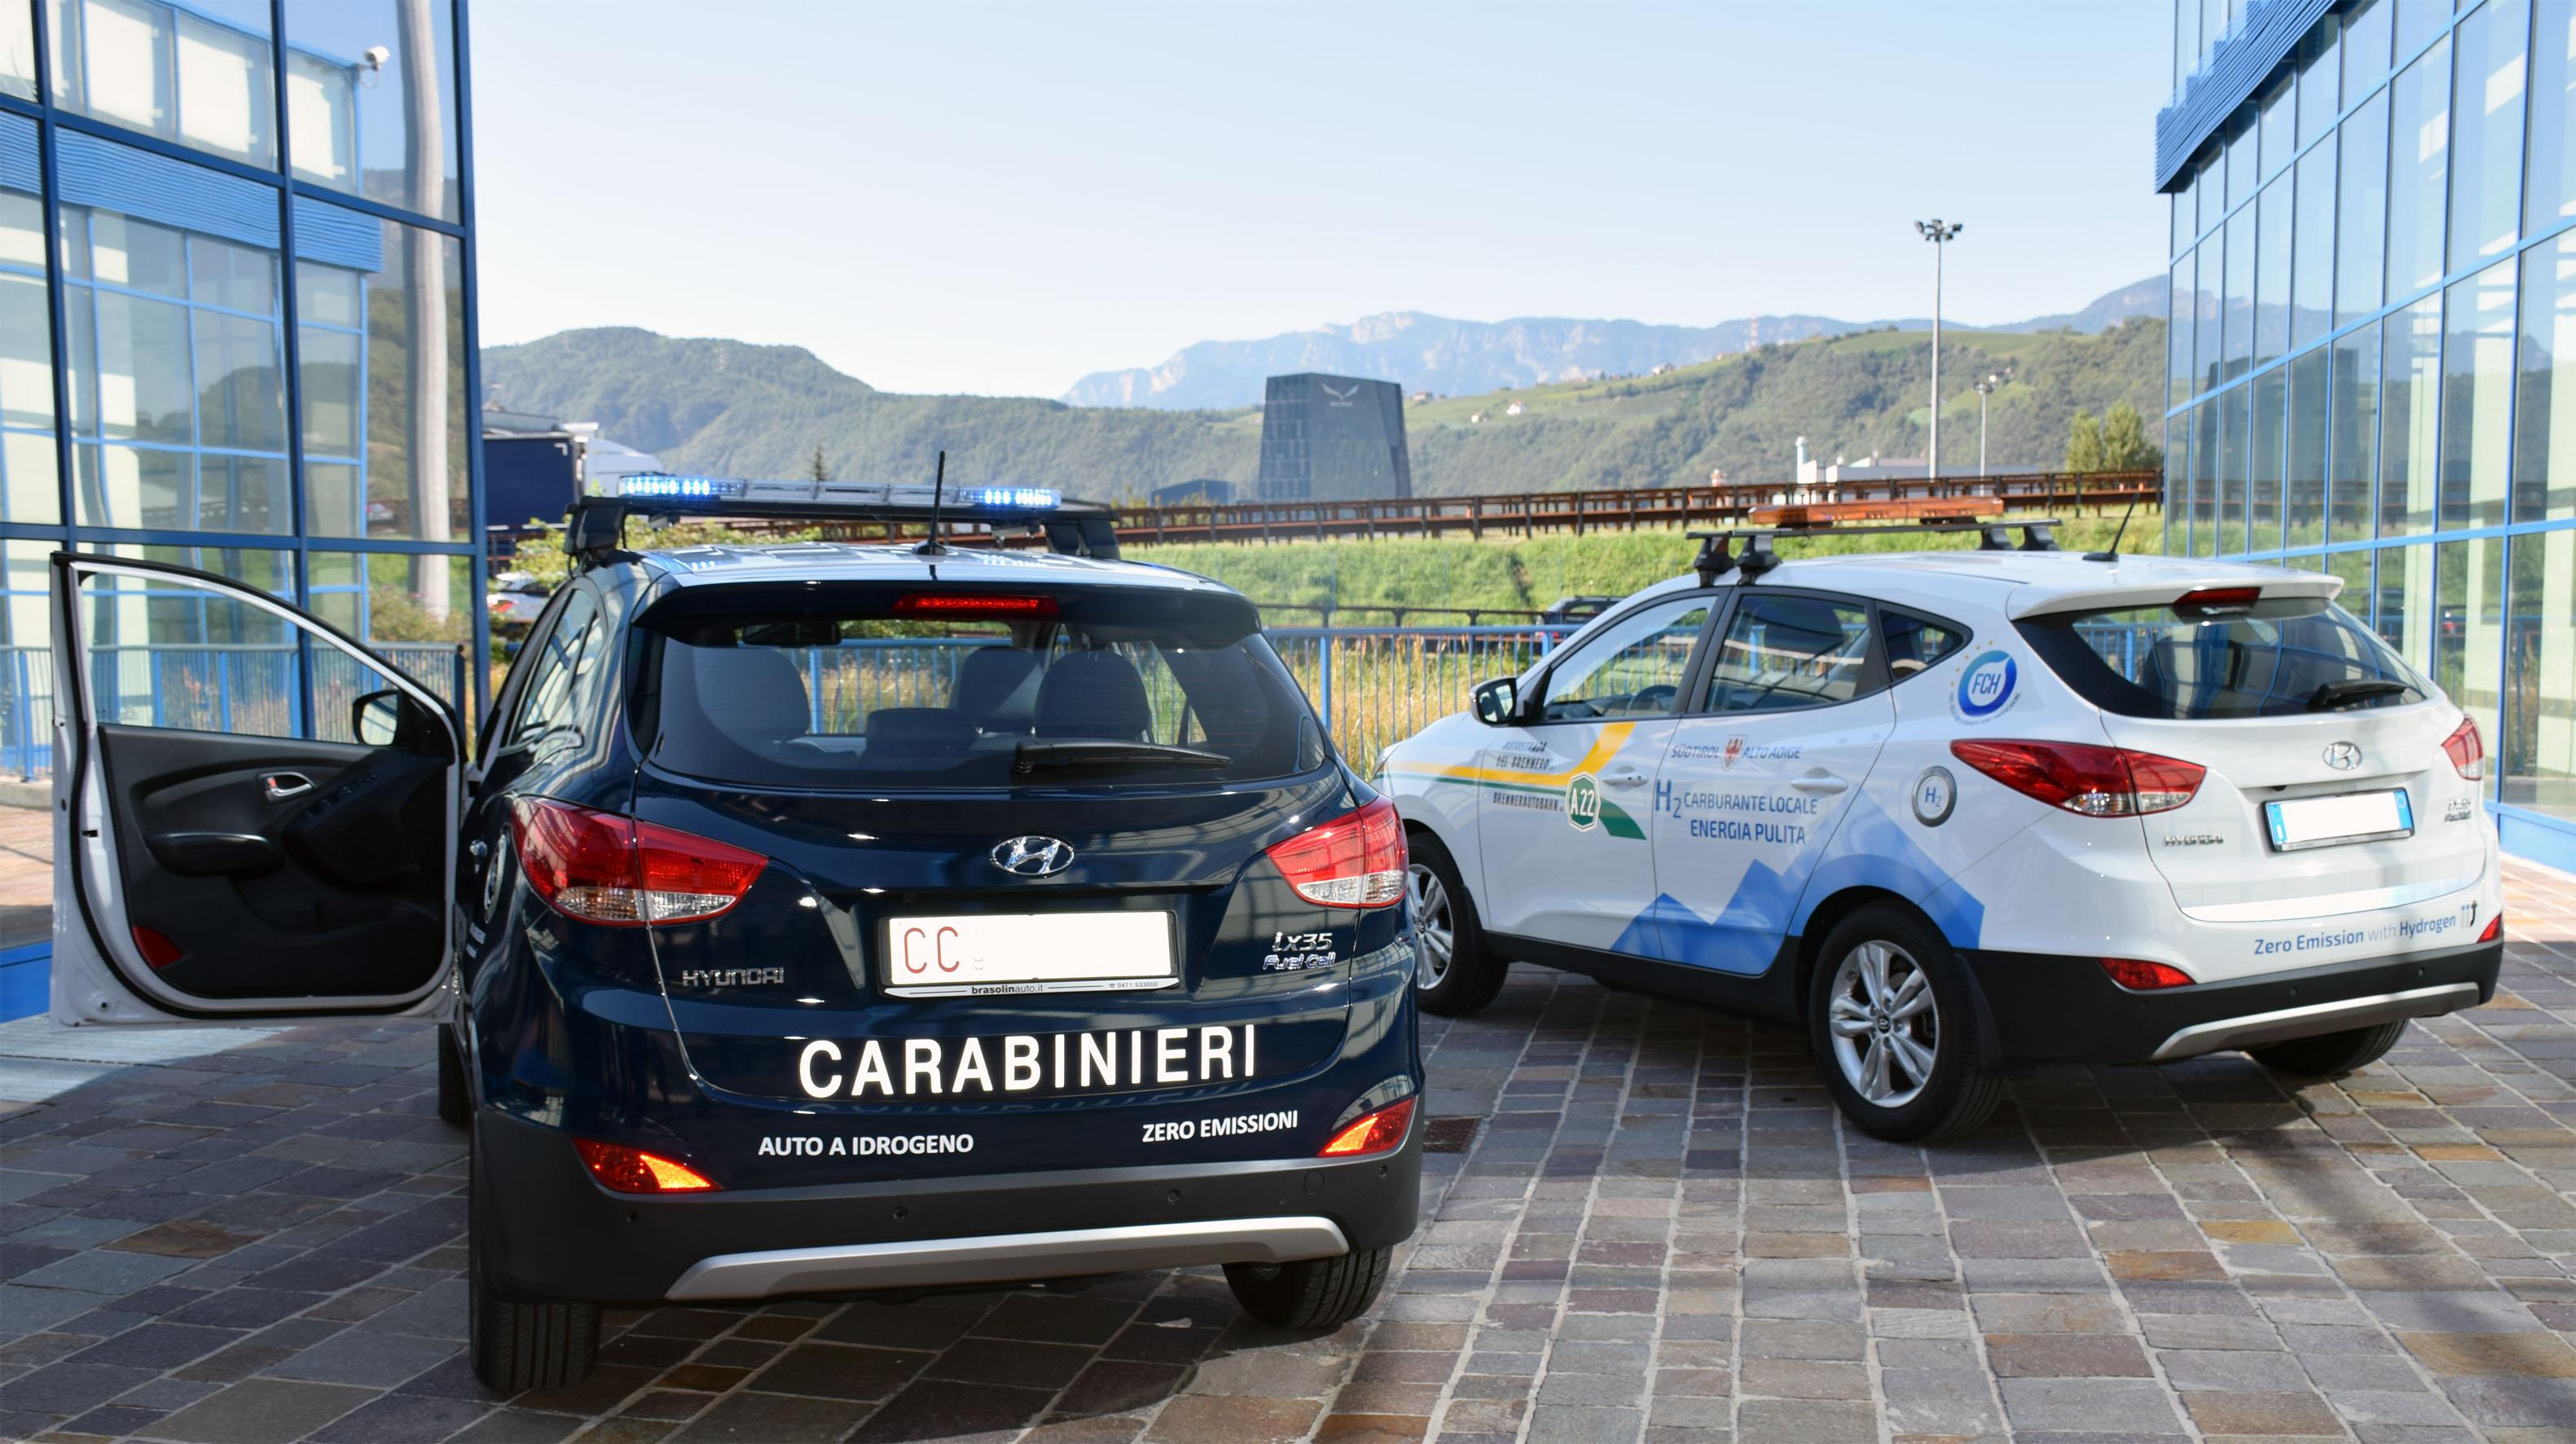 auto_idrogeno_carabinieri_A22